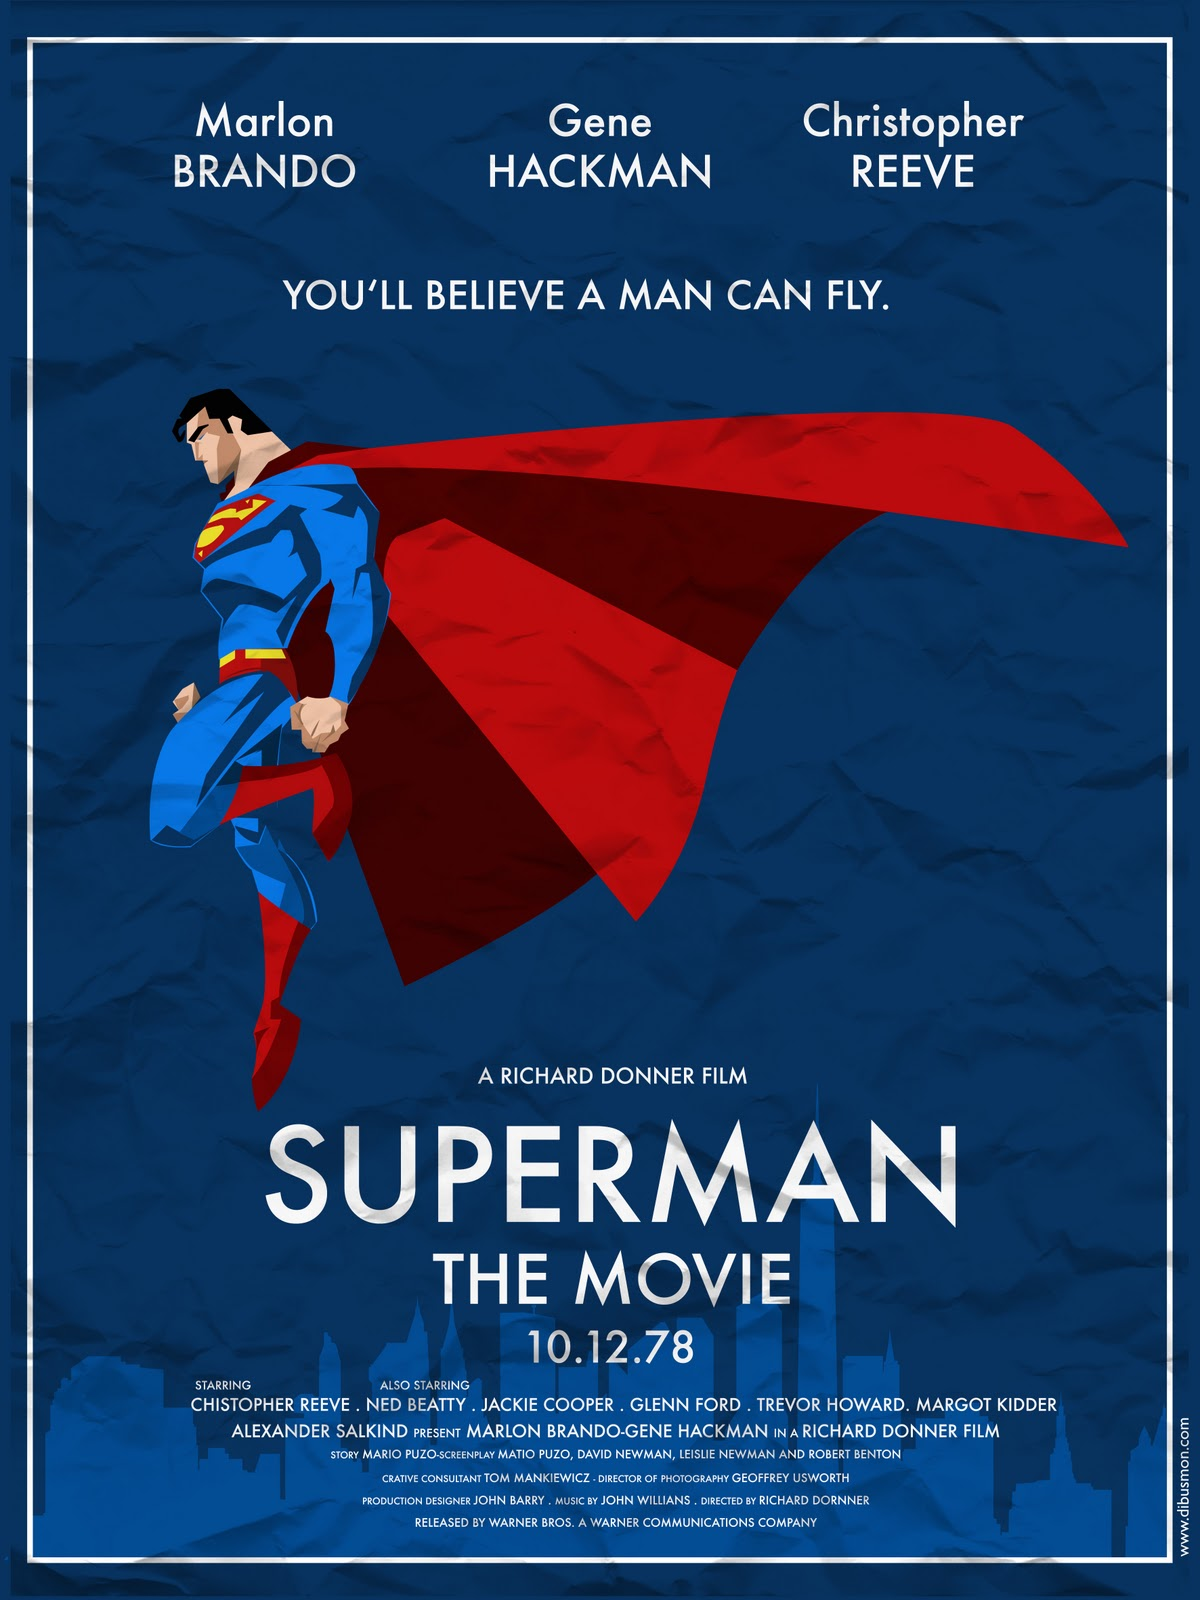 alternative 1978 superman movie poster. | Movies | Pinterest